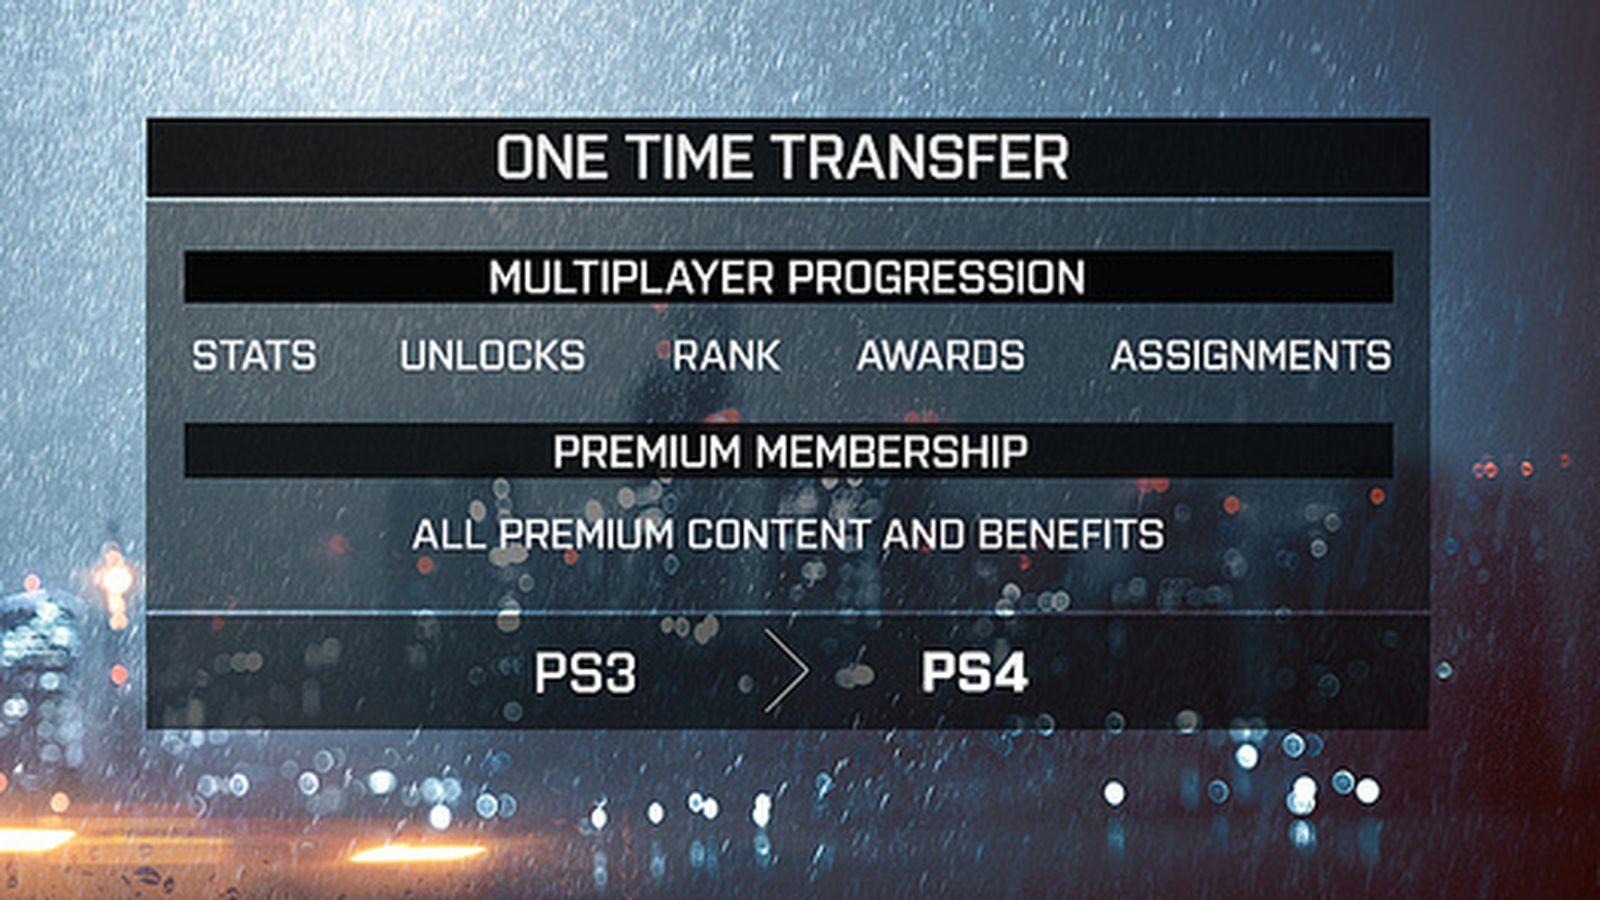 Battlefield 4 Will Allow Premium Membership Stat Transfer Cross Gen Polygon